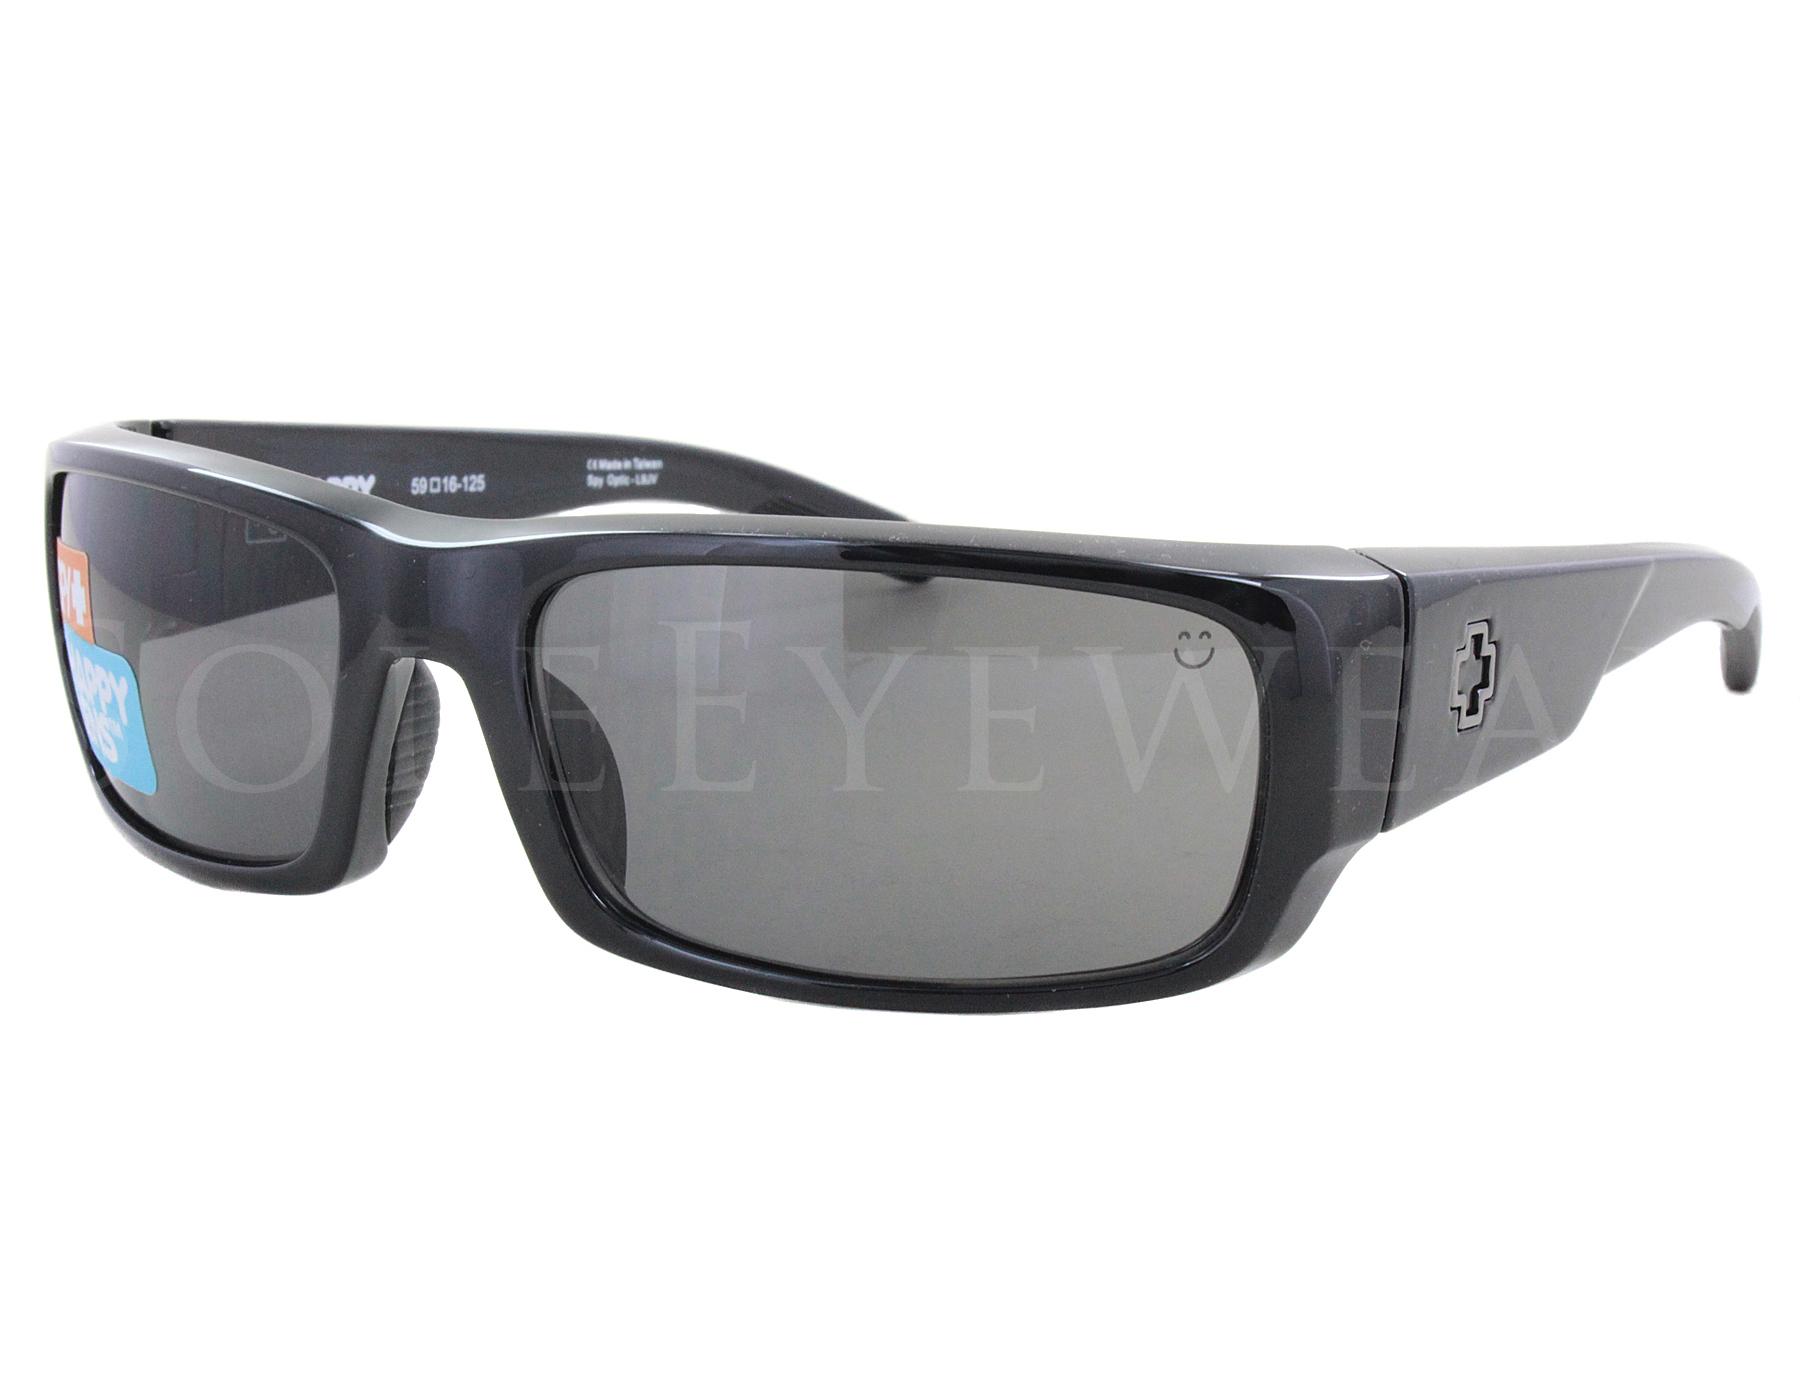 a2131efd843 Details about NEW Spy Optics Caliber 673374038863 Black   Happy Grey Green  Sunglasses